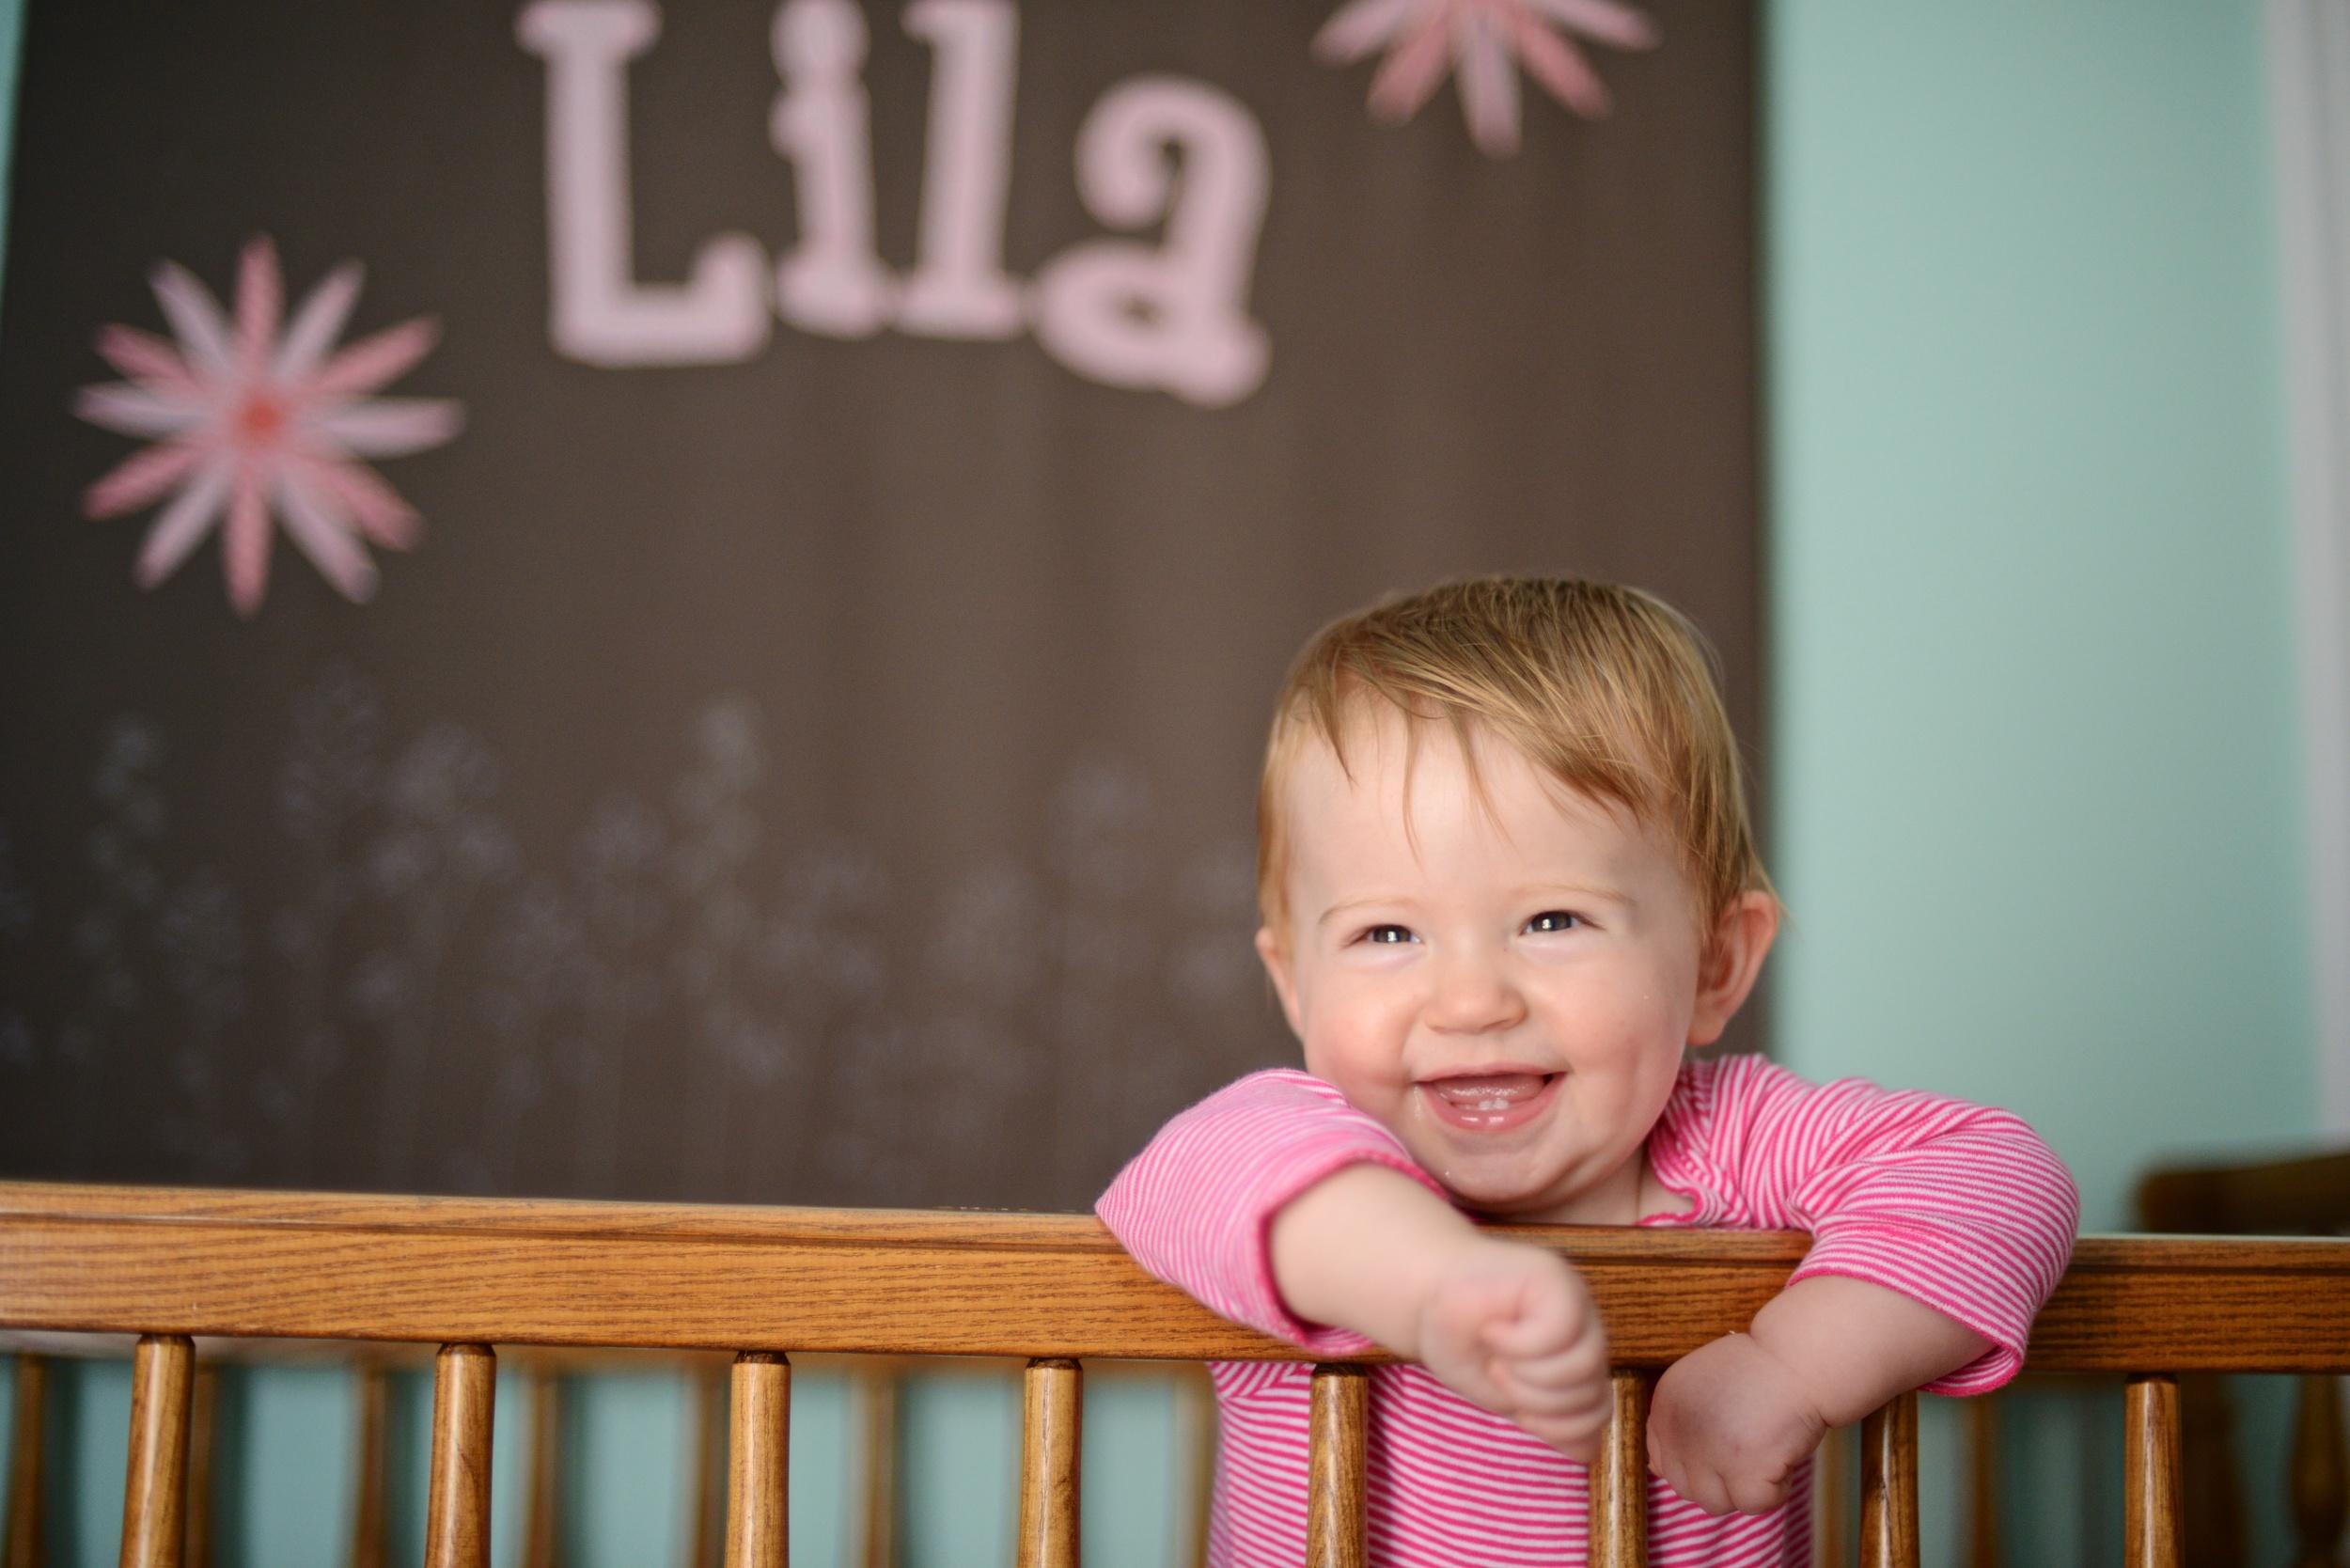 Lila!